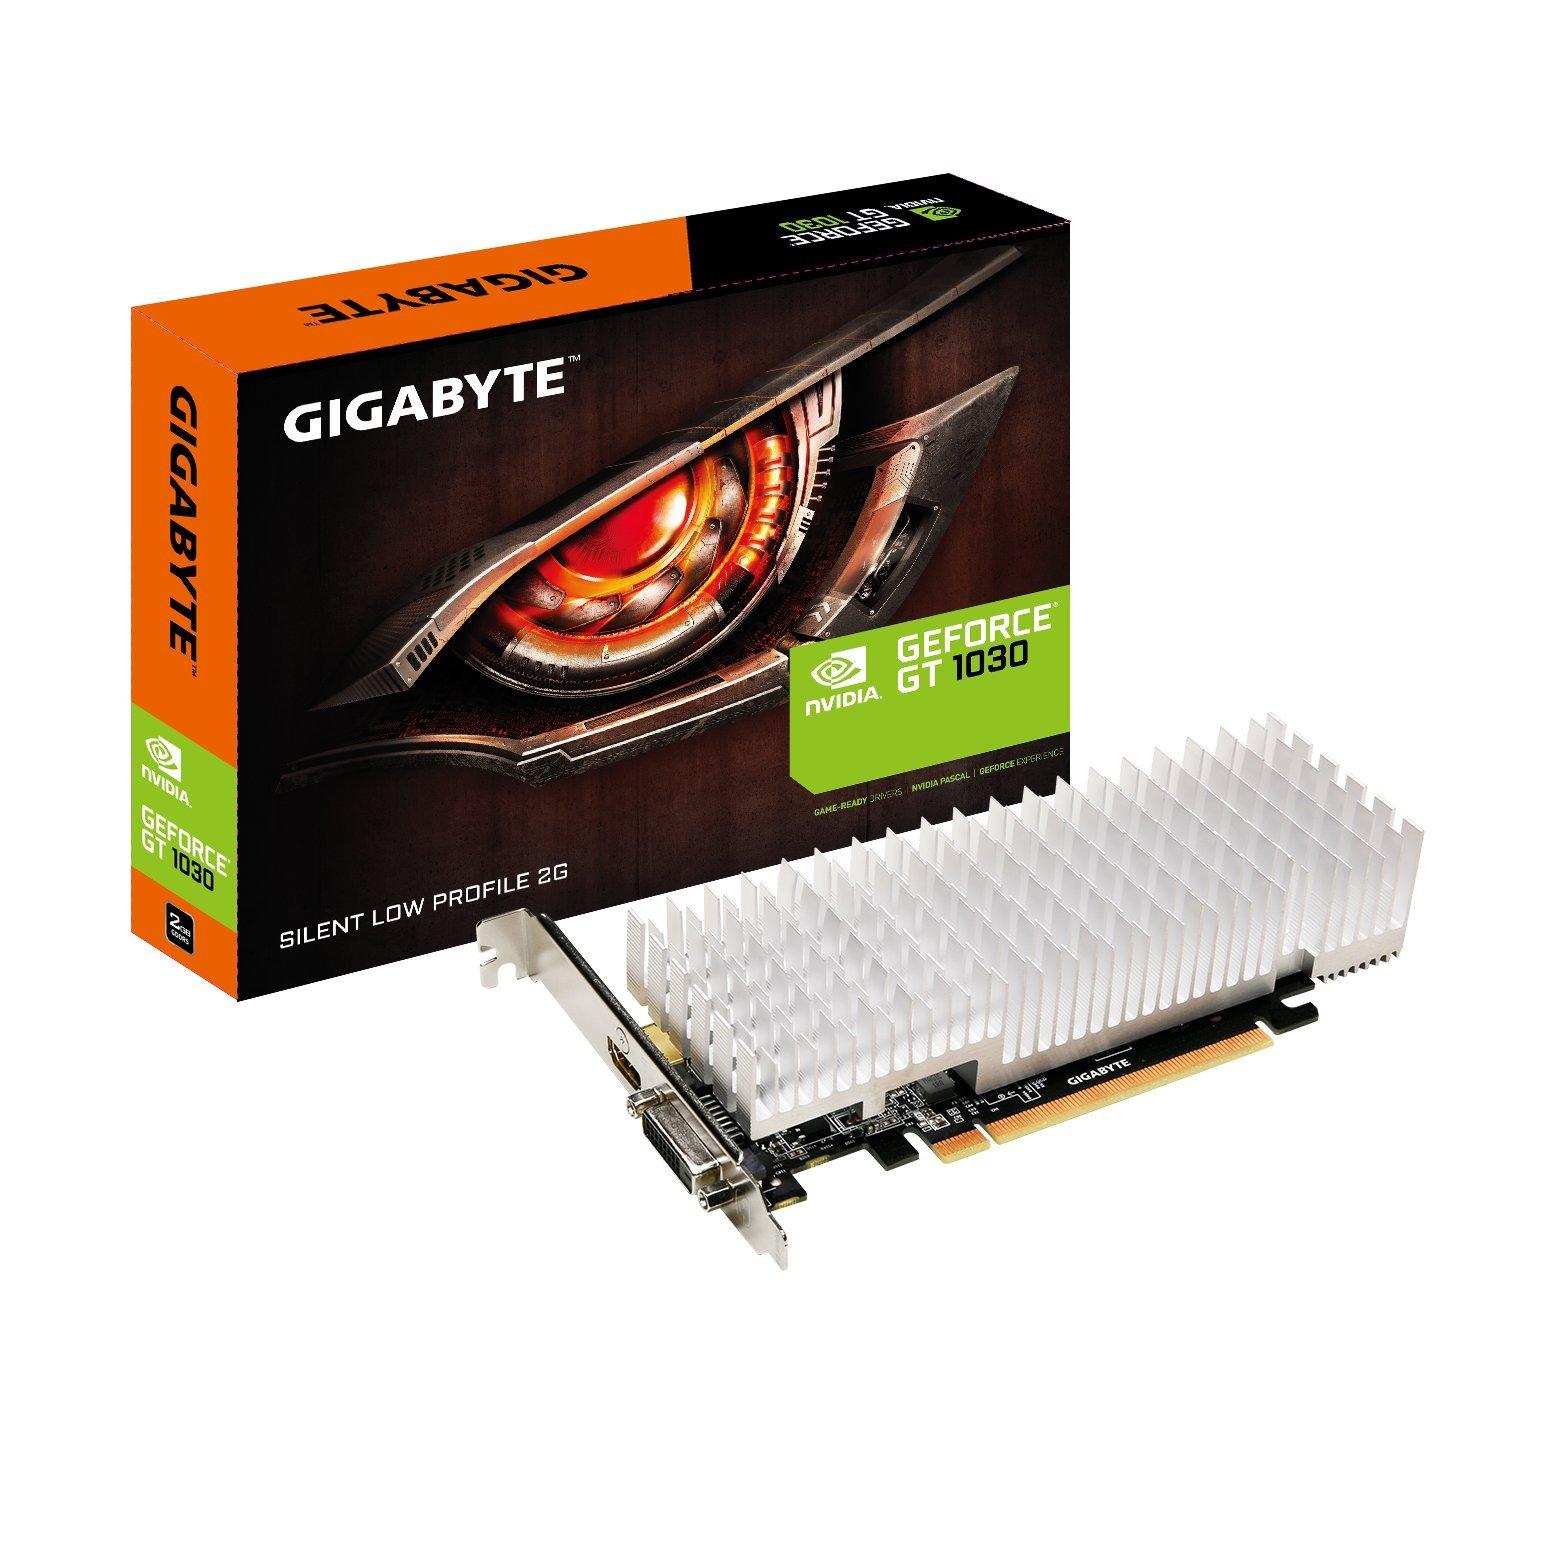 GIGABYTE GeForce GT 1030 GV-N1030SL-2GL Silent Low Profile 2G